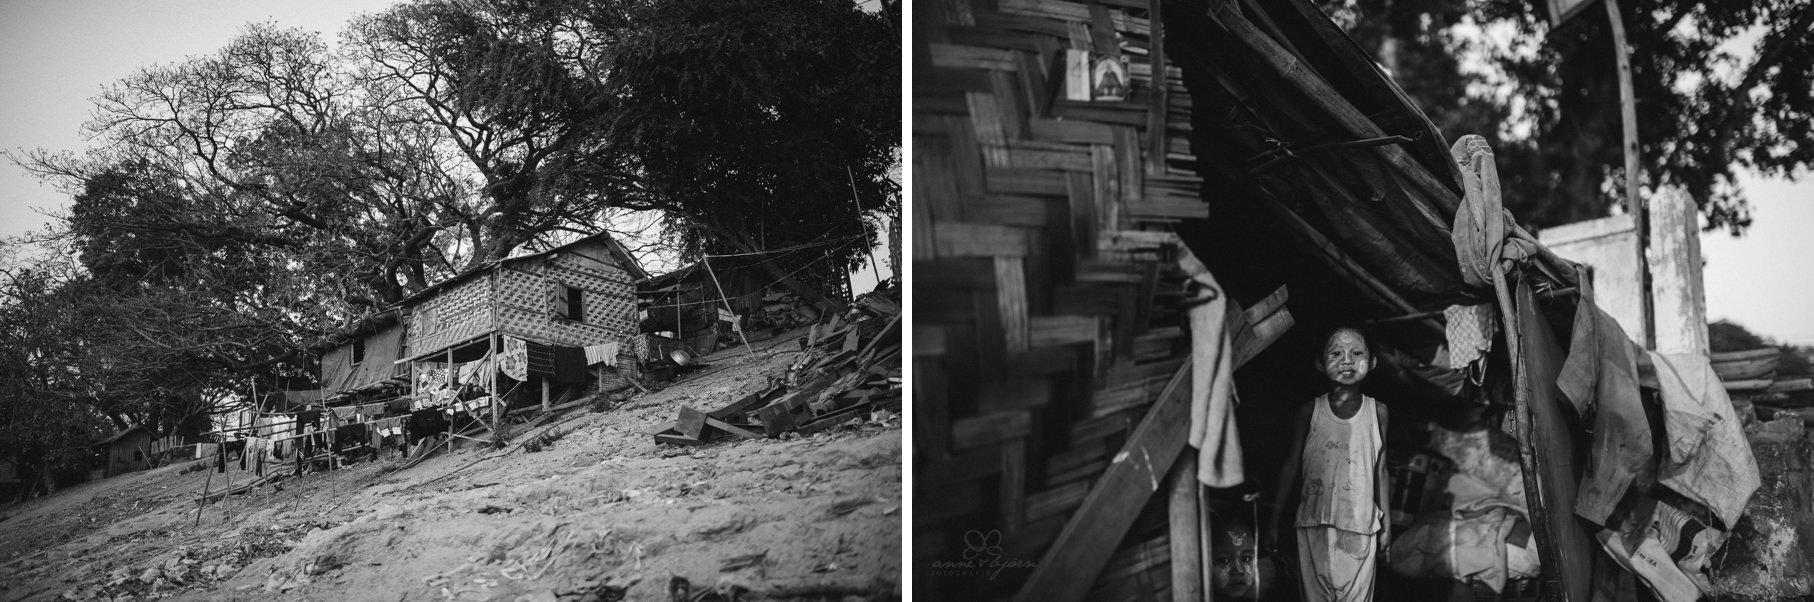 0061 yangon mandalay d76 7075 - Großstädte Myanmars - Yangon & Mandalay